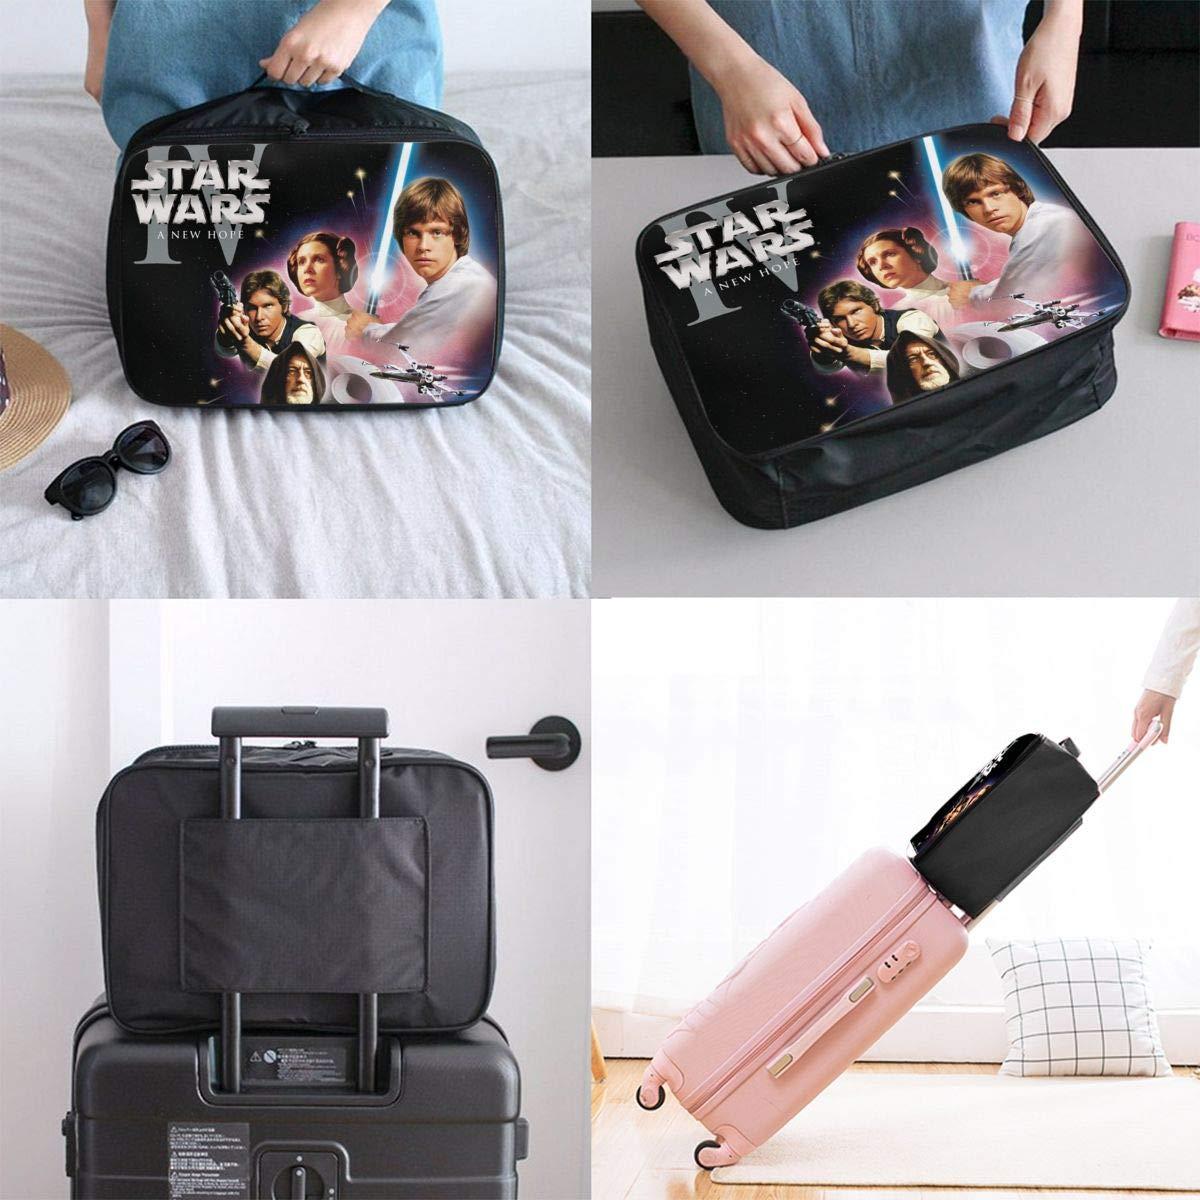 BOKAIKAI1306 Cool S-Star Wars Unisex Adult Fashion Lightweight Large Capacity Portable Large Travel Duffel Bag Mens Woman Luggage Bag 3D Printing Customized Boarding Box